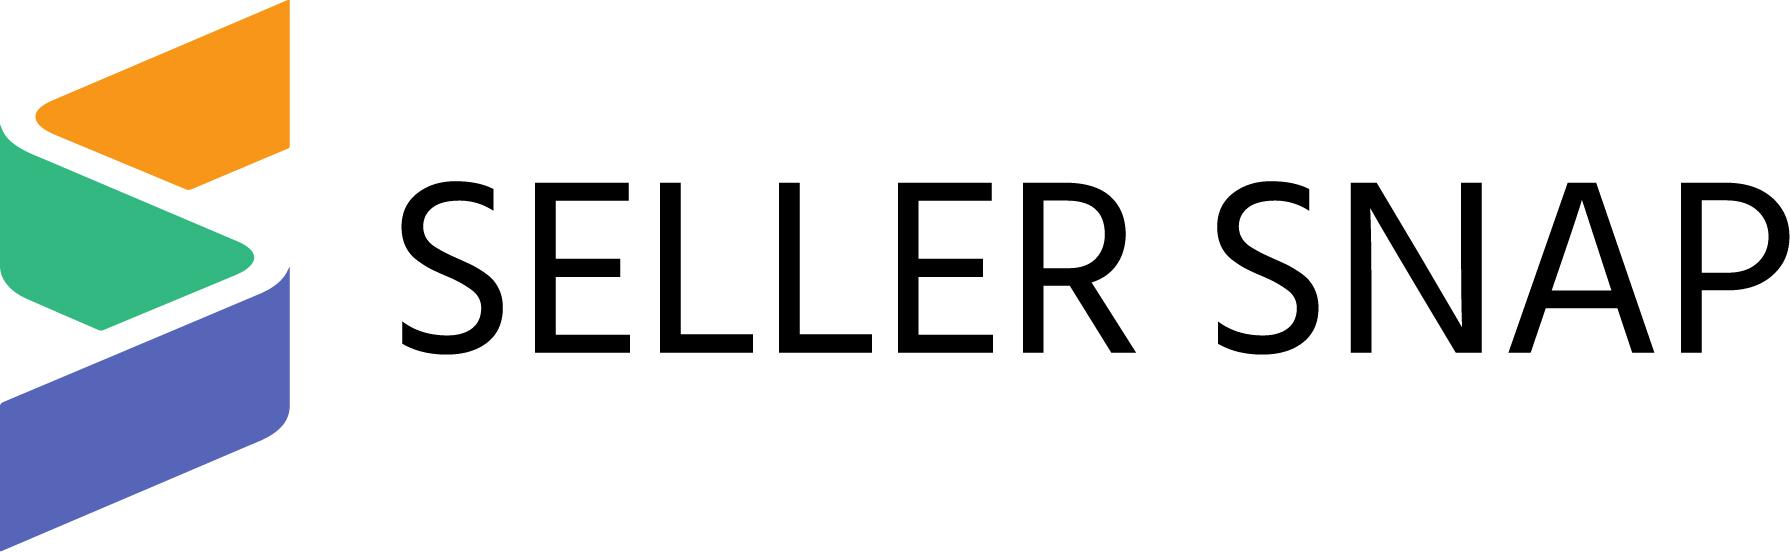 Seller Snap logo